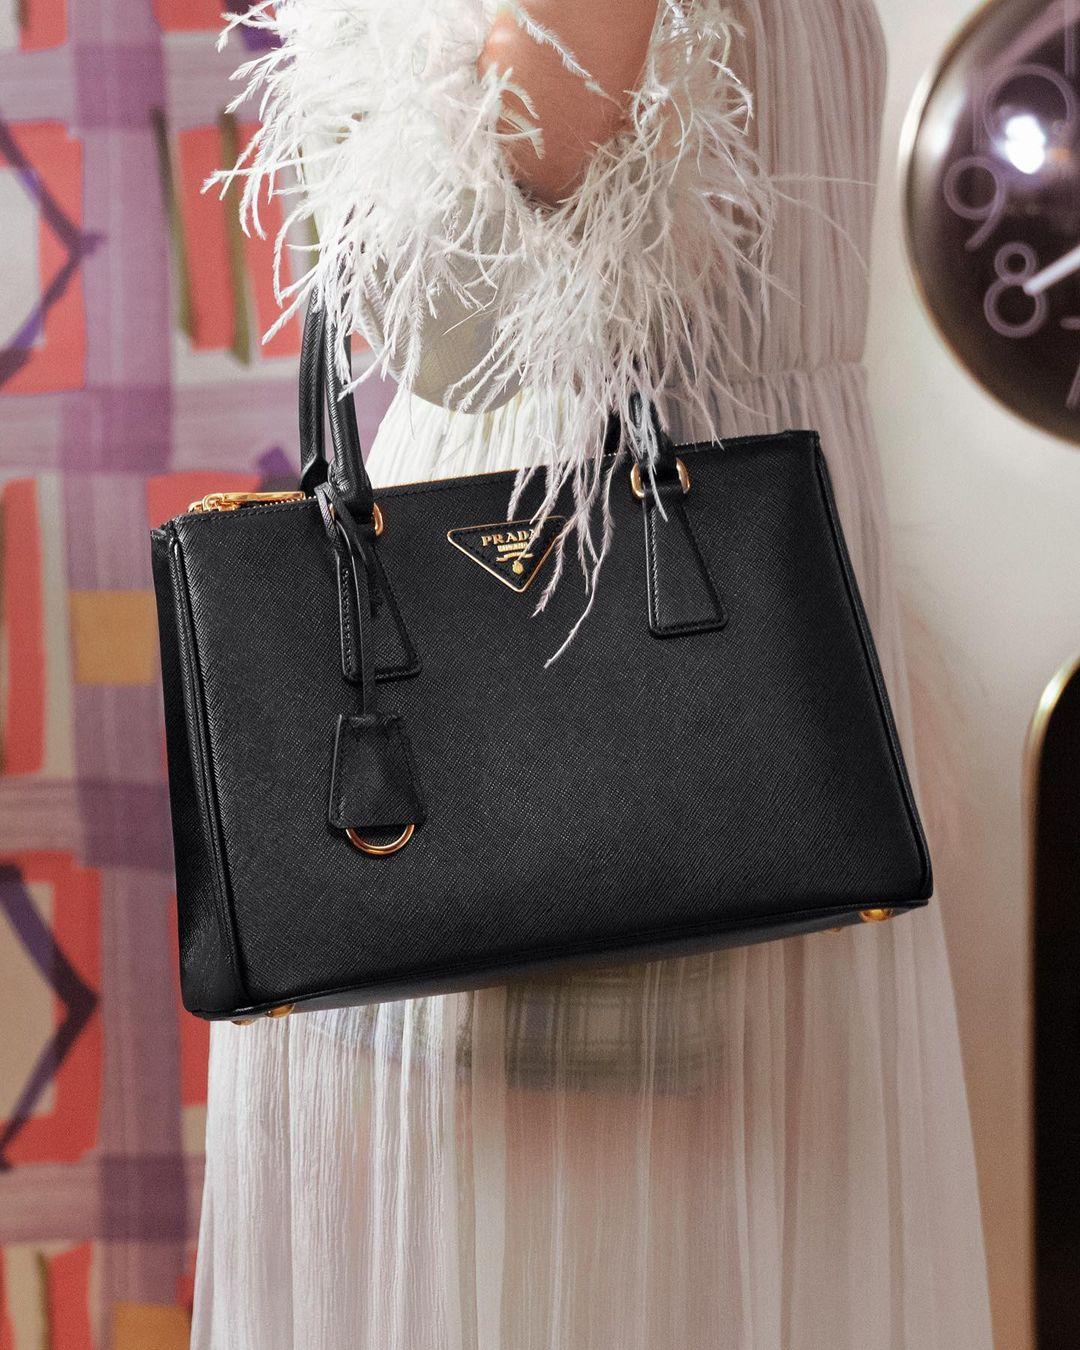 Galleria من Prada حقيبة جاليريا من برادا